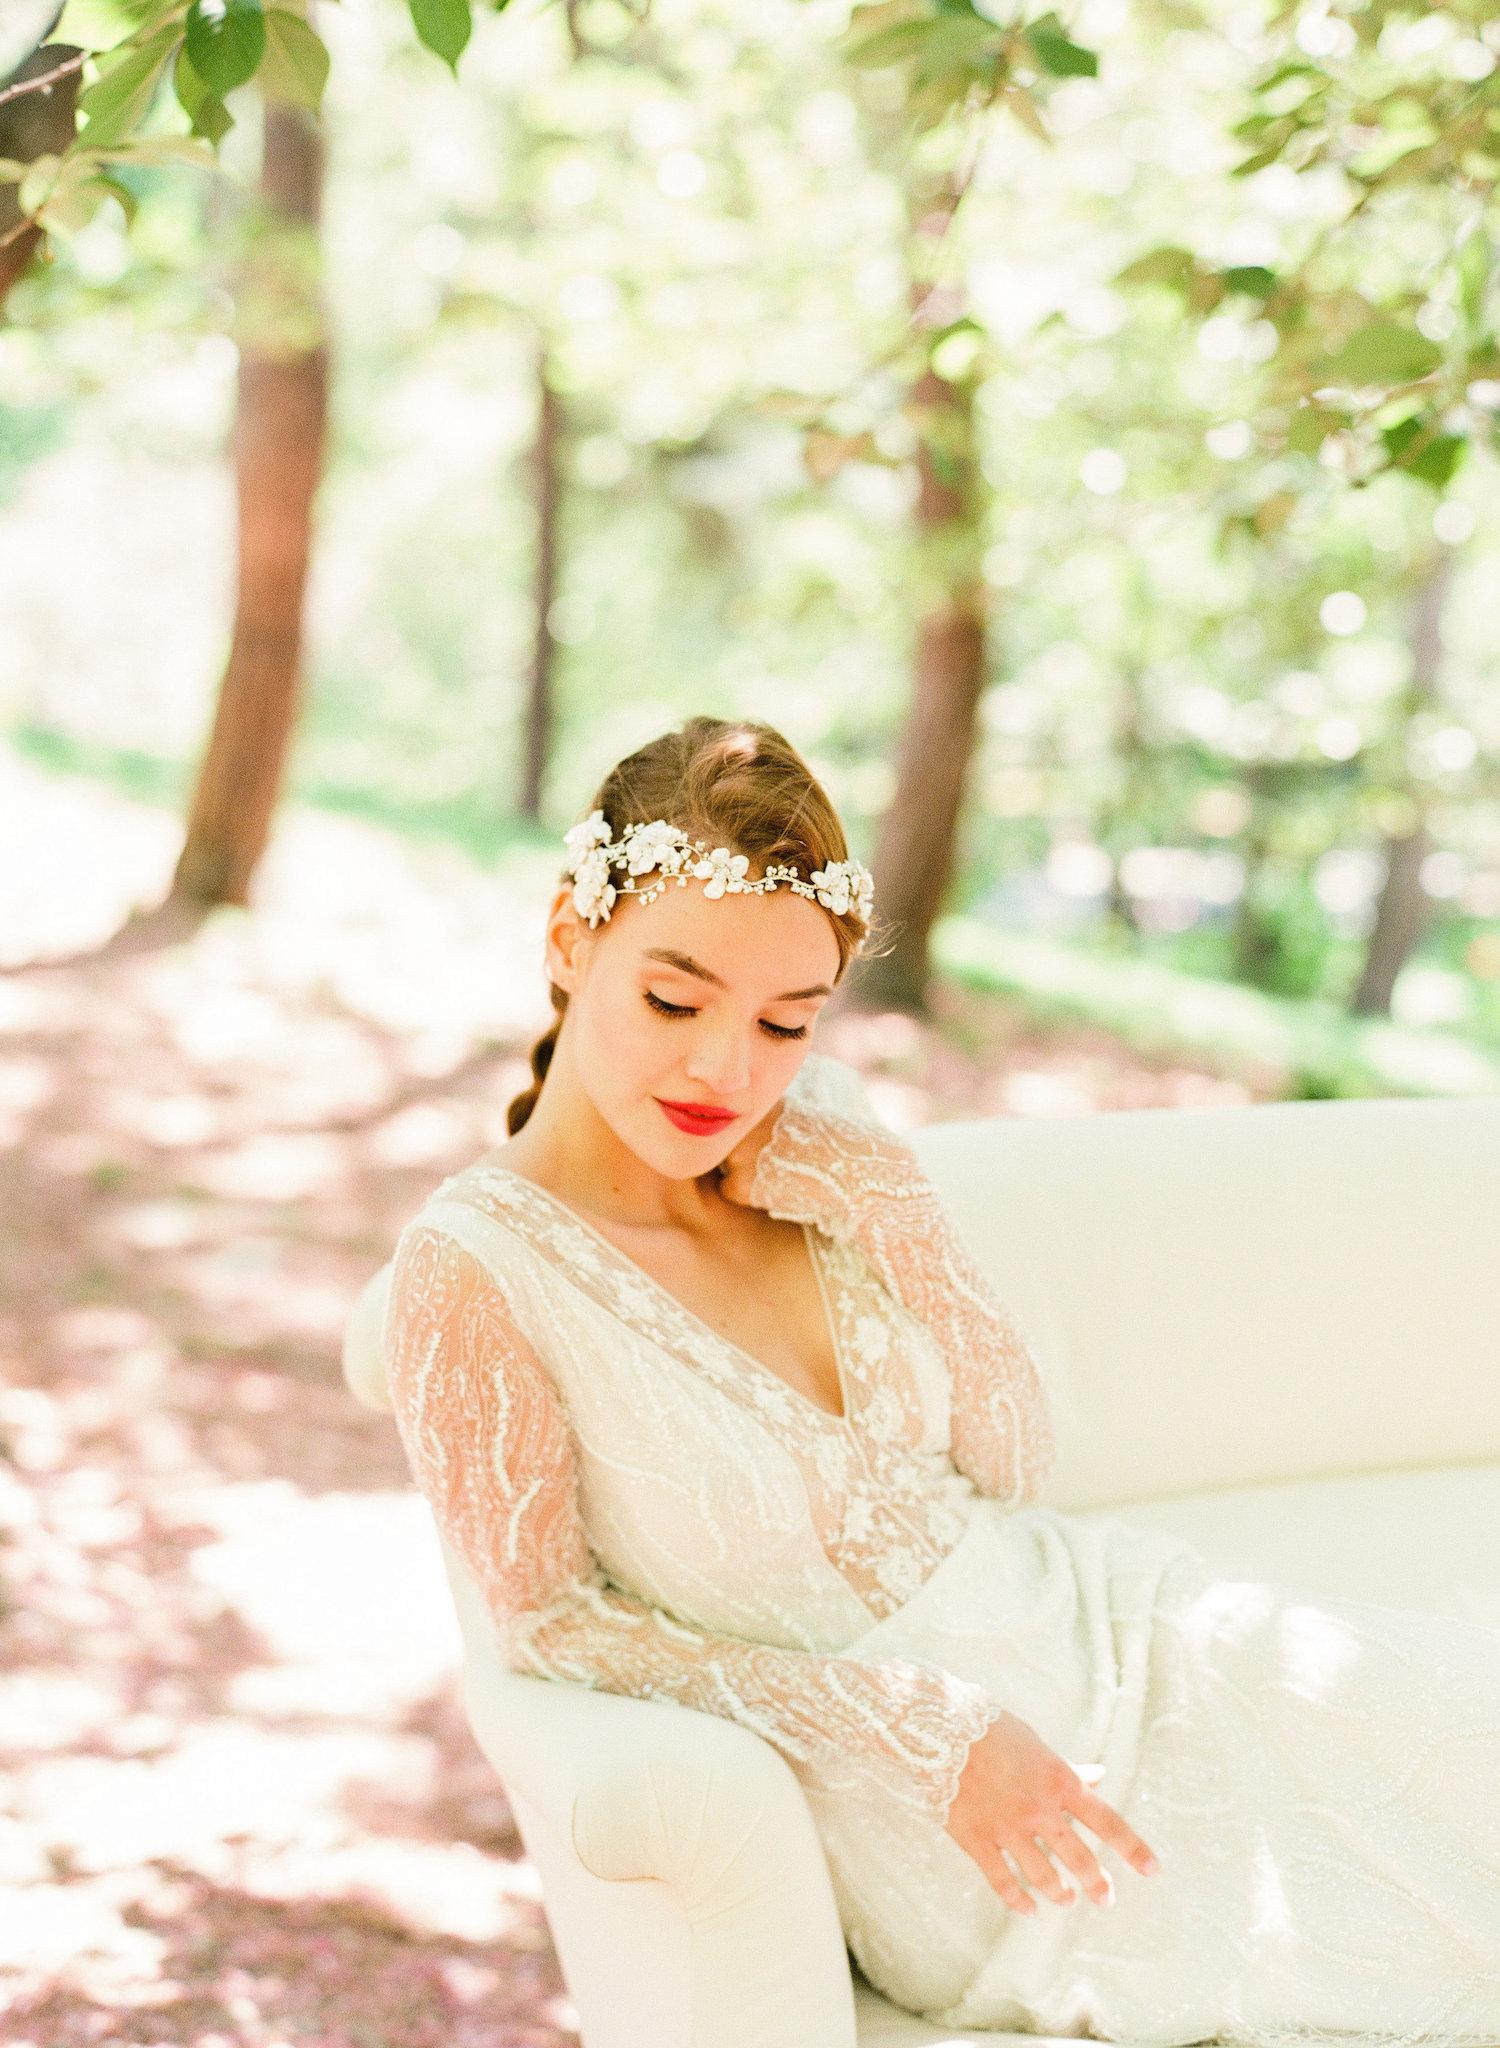 Morning Glow - Full Aperture Floral & Lindsay Madden Photography 47.jpeg